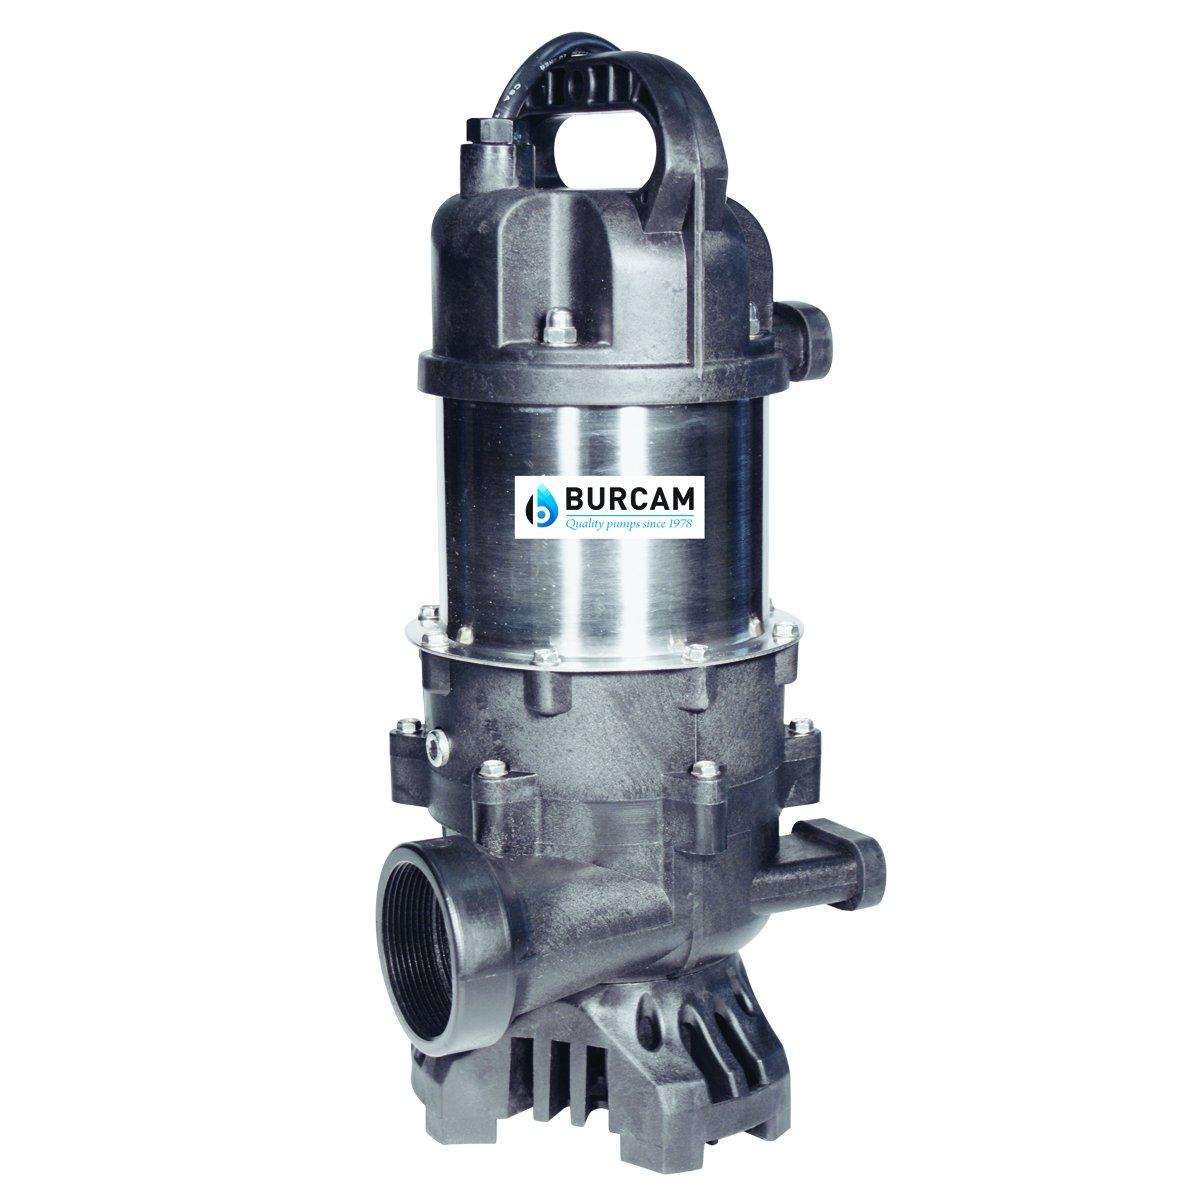 BURCAM 300910 1/2 HP Submersible Waterfall and Fountain Pump